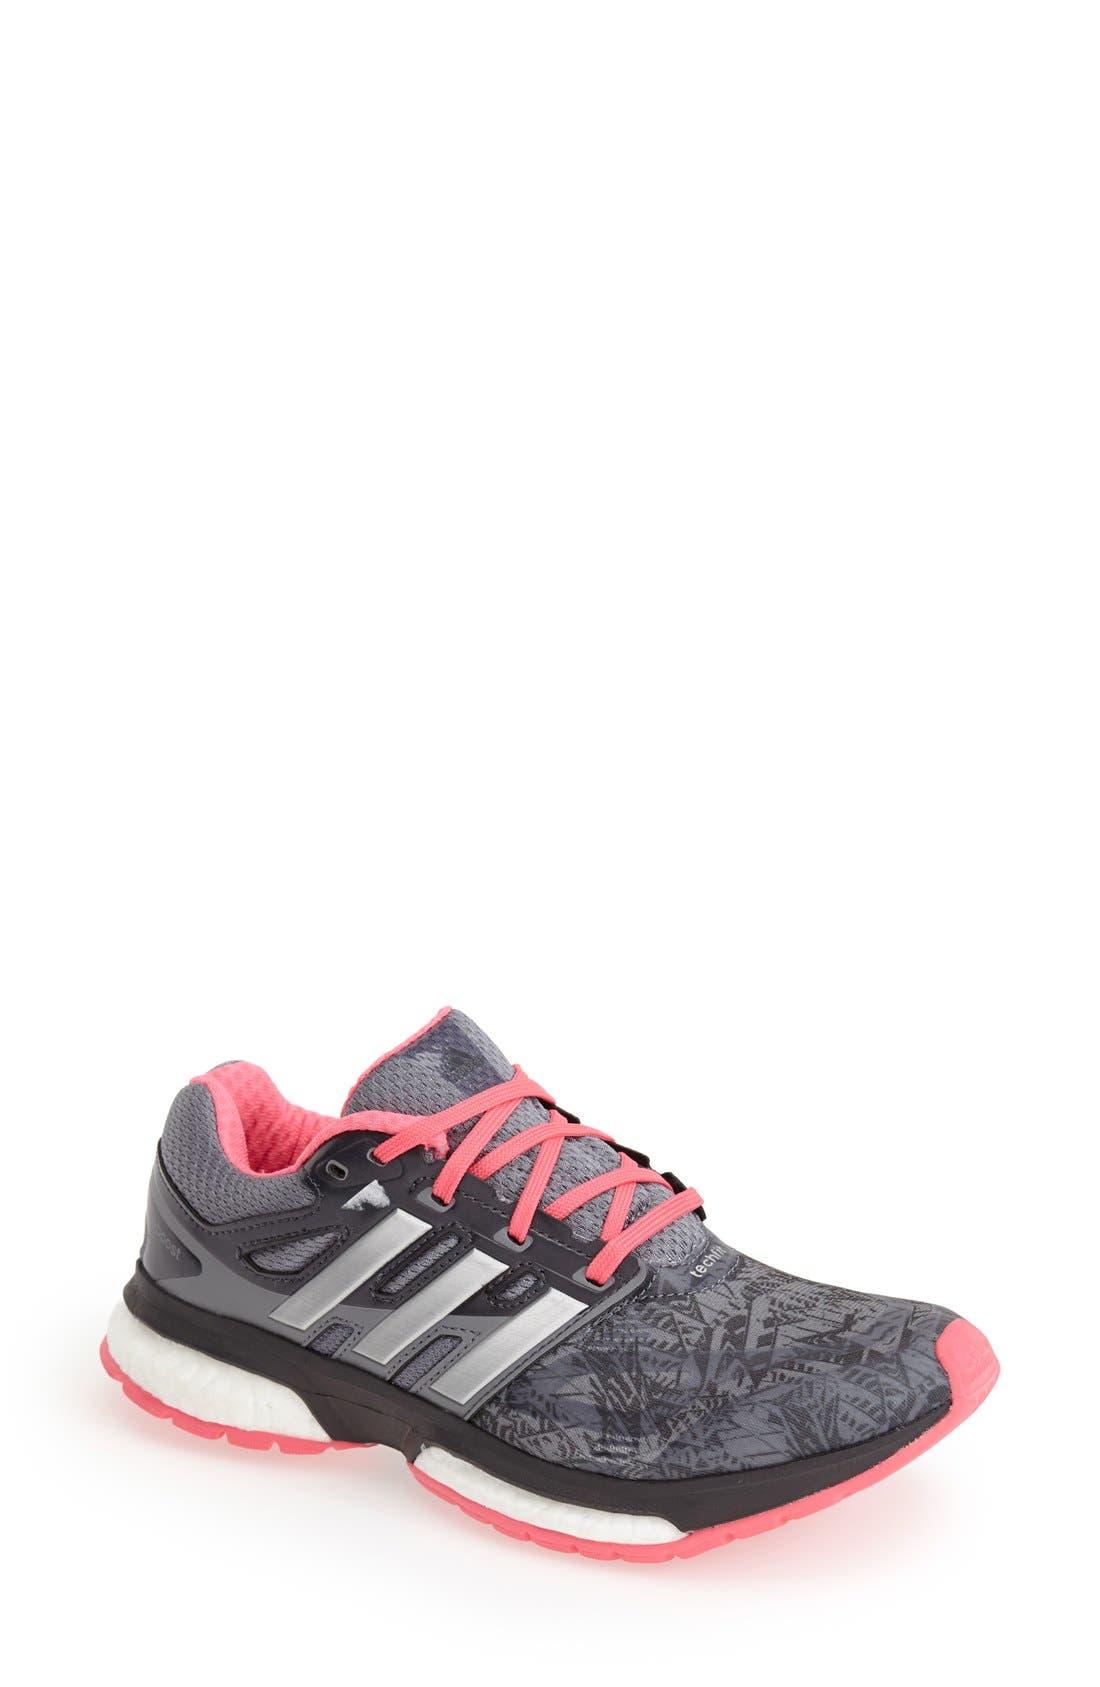 Alternate Image 1 Selected - adidas 'Response Boost' Running Shoe (Women)